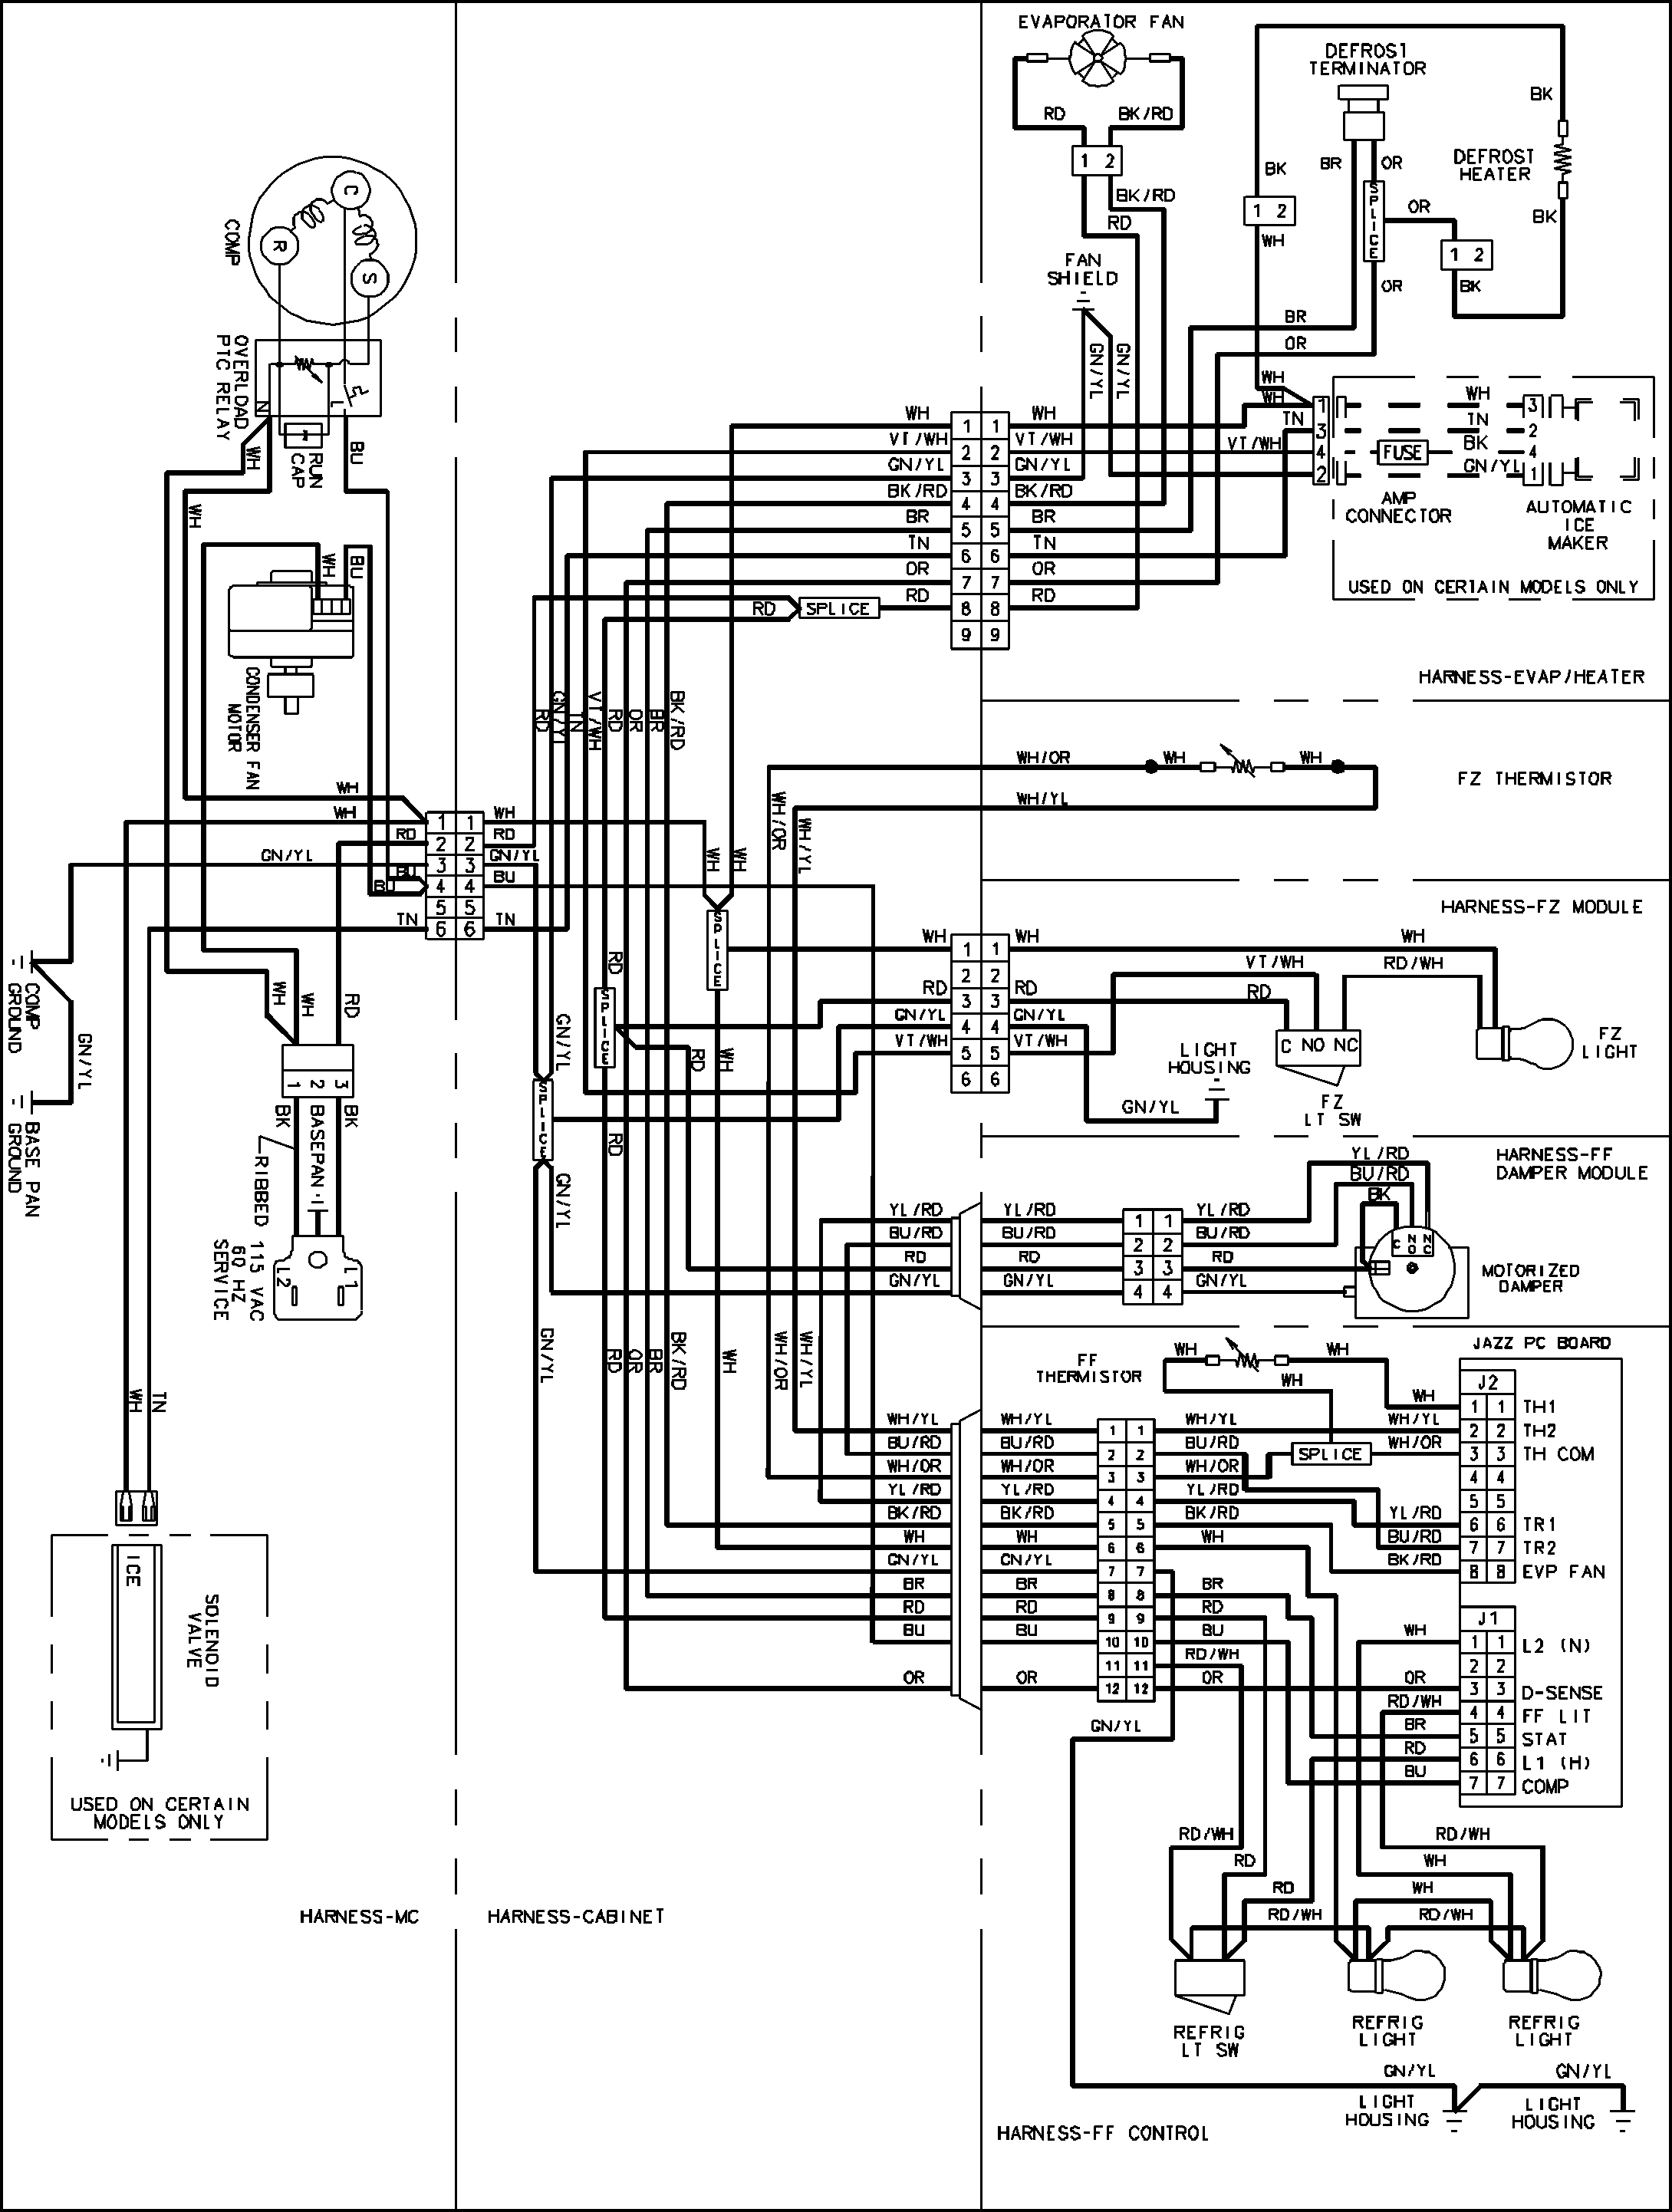 M0703075 00011?resize\\\=665%2C879 de303 wiring diagram wiring diagrams Basic Electrical Wiring Diagrams at crackthecode.co